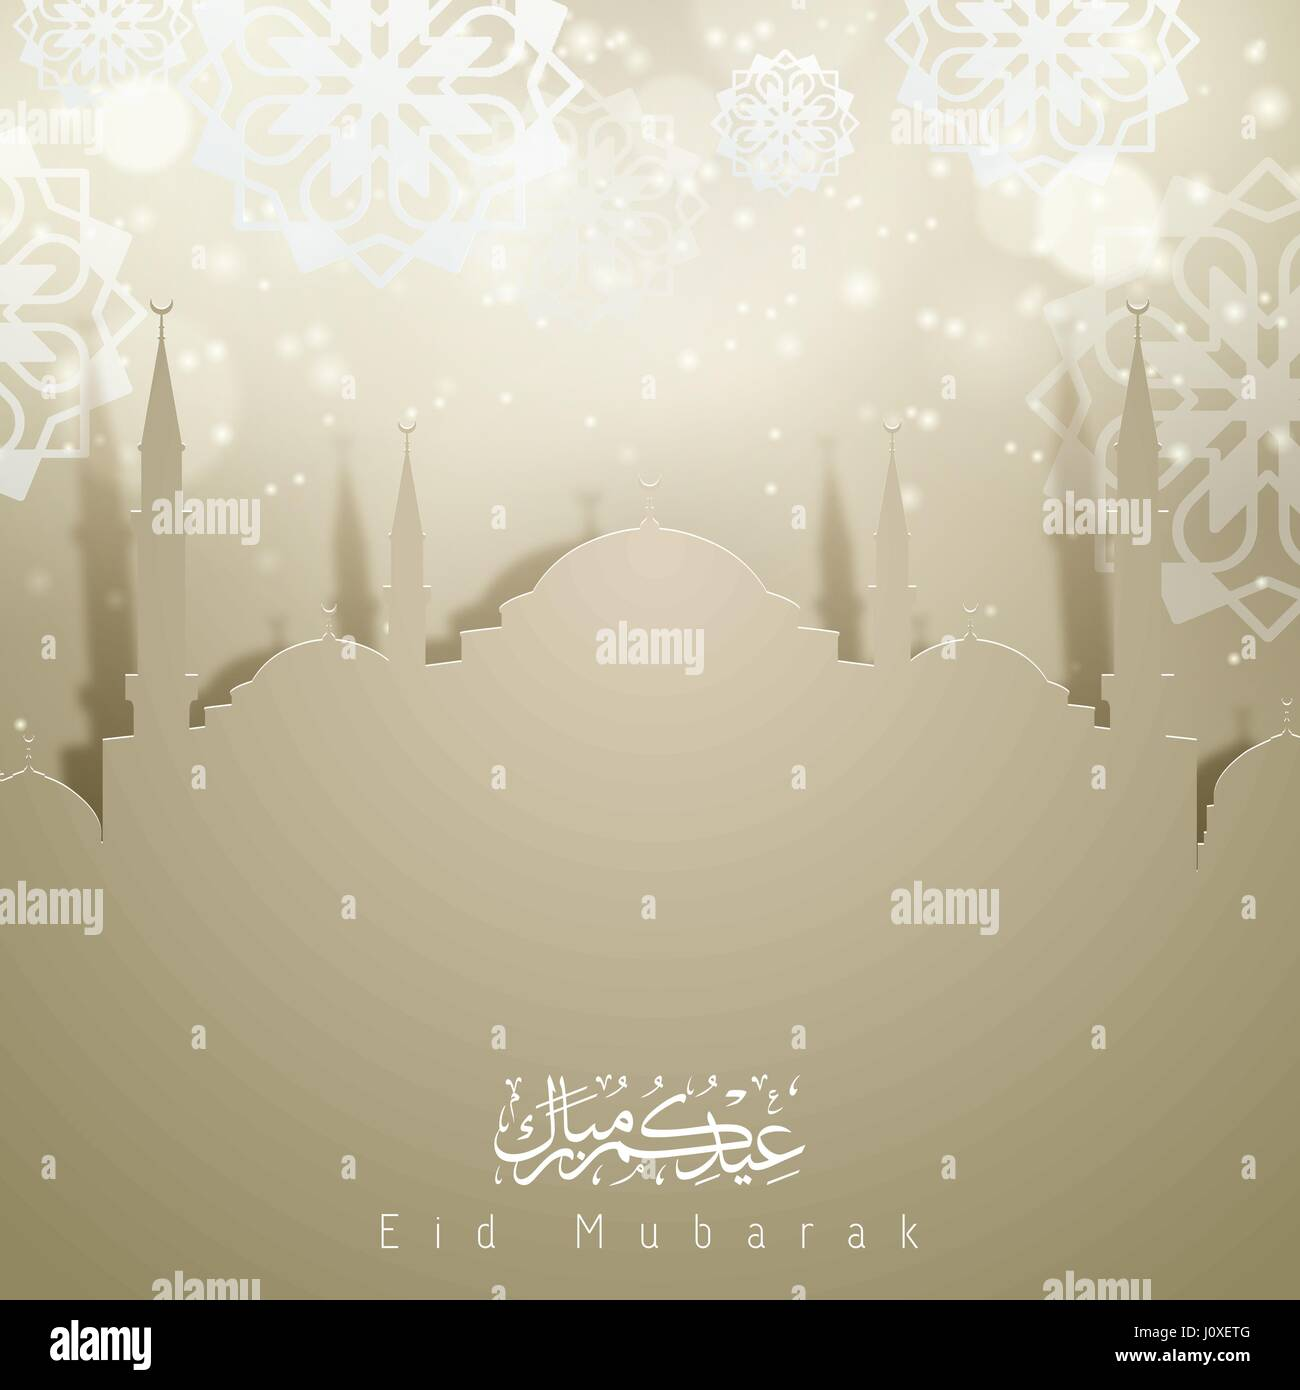 Eid mubarak greeting card background stock vector art illustration eid mubarak greeting card background kristyandbryce Choice Image